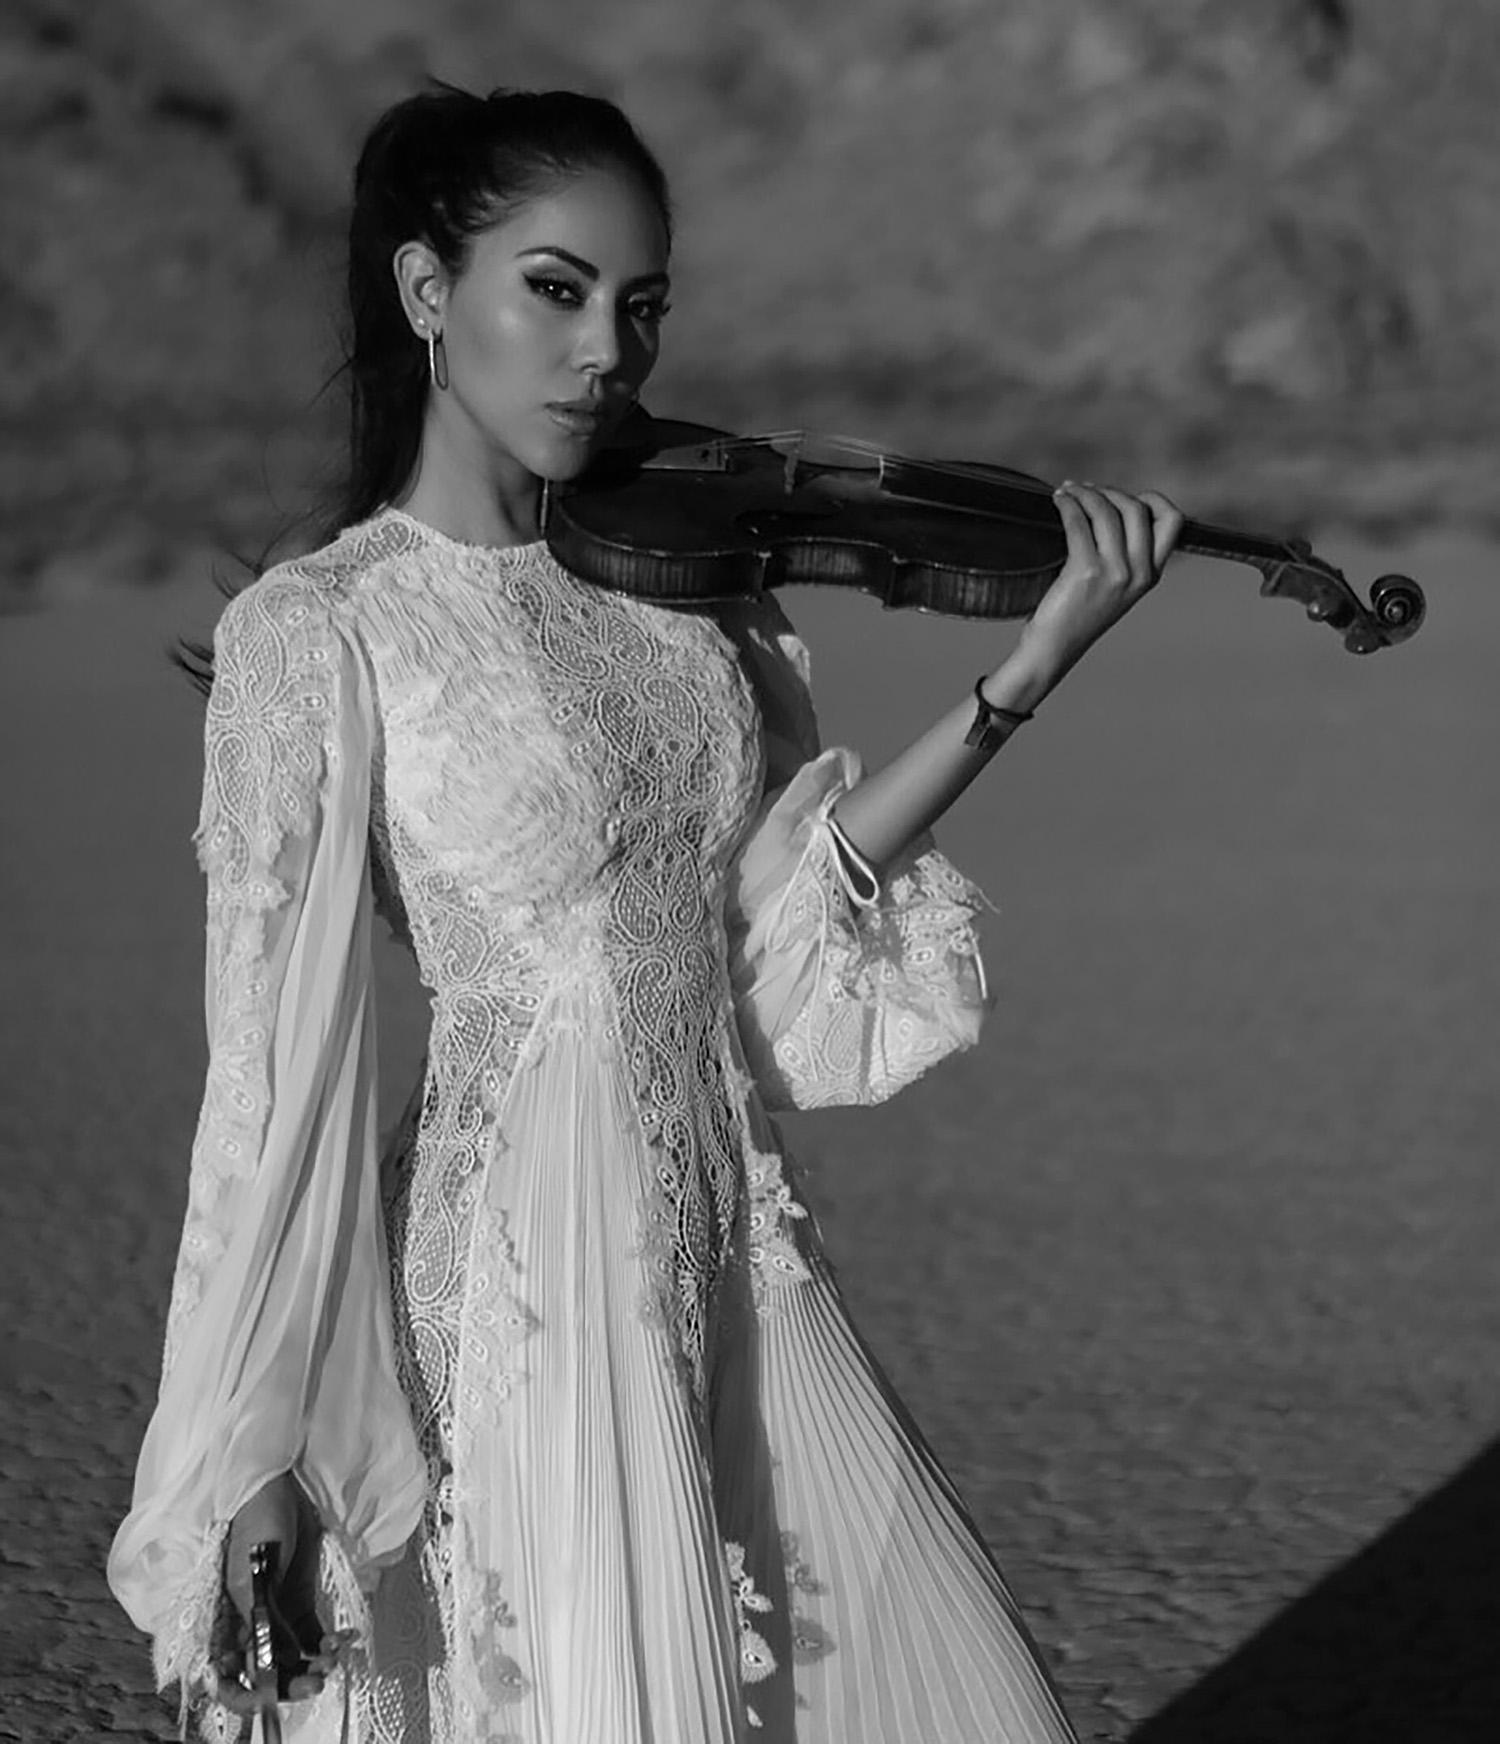 esther-anaya-white-dress-desert-52blend-profile-1500pix.jpg